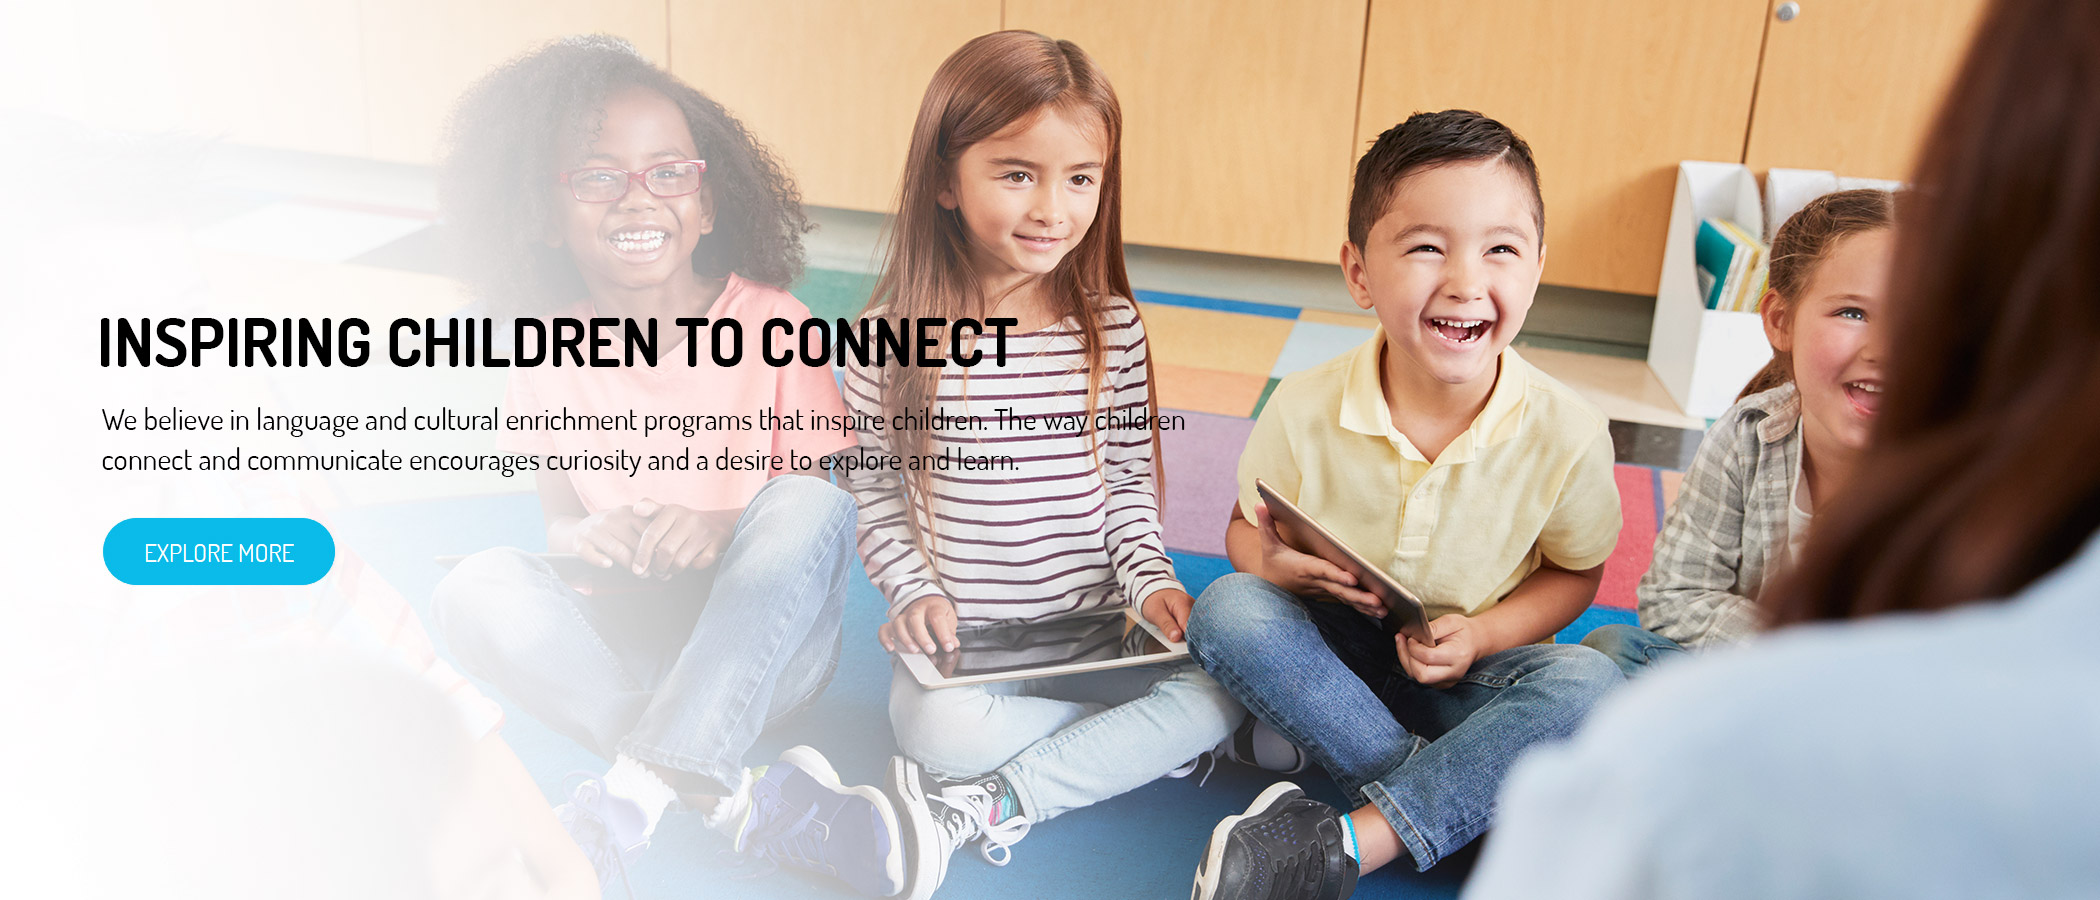 Inspiring Children To Connect